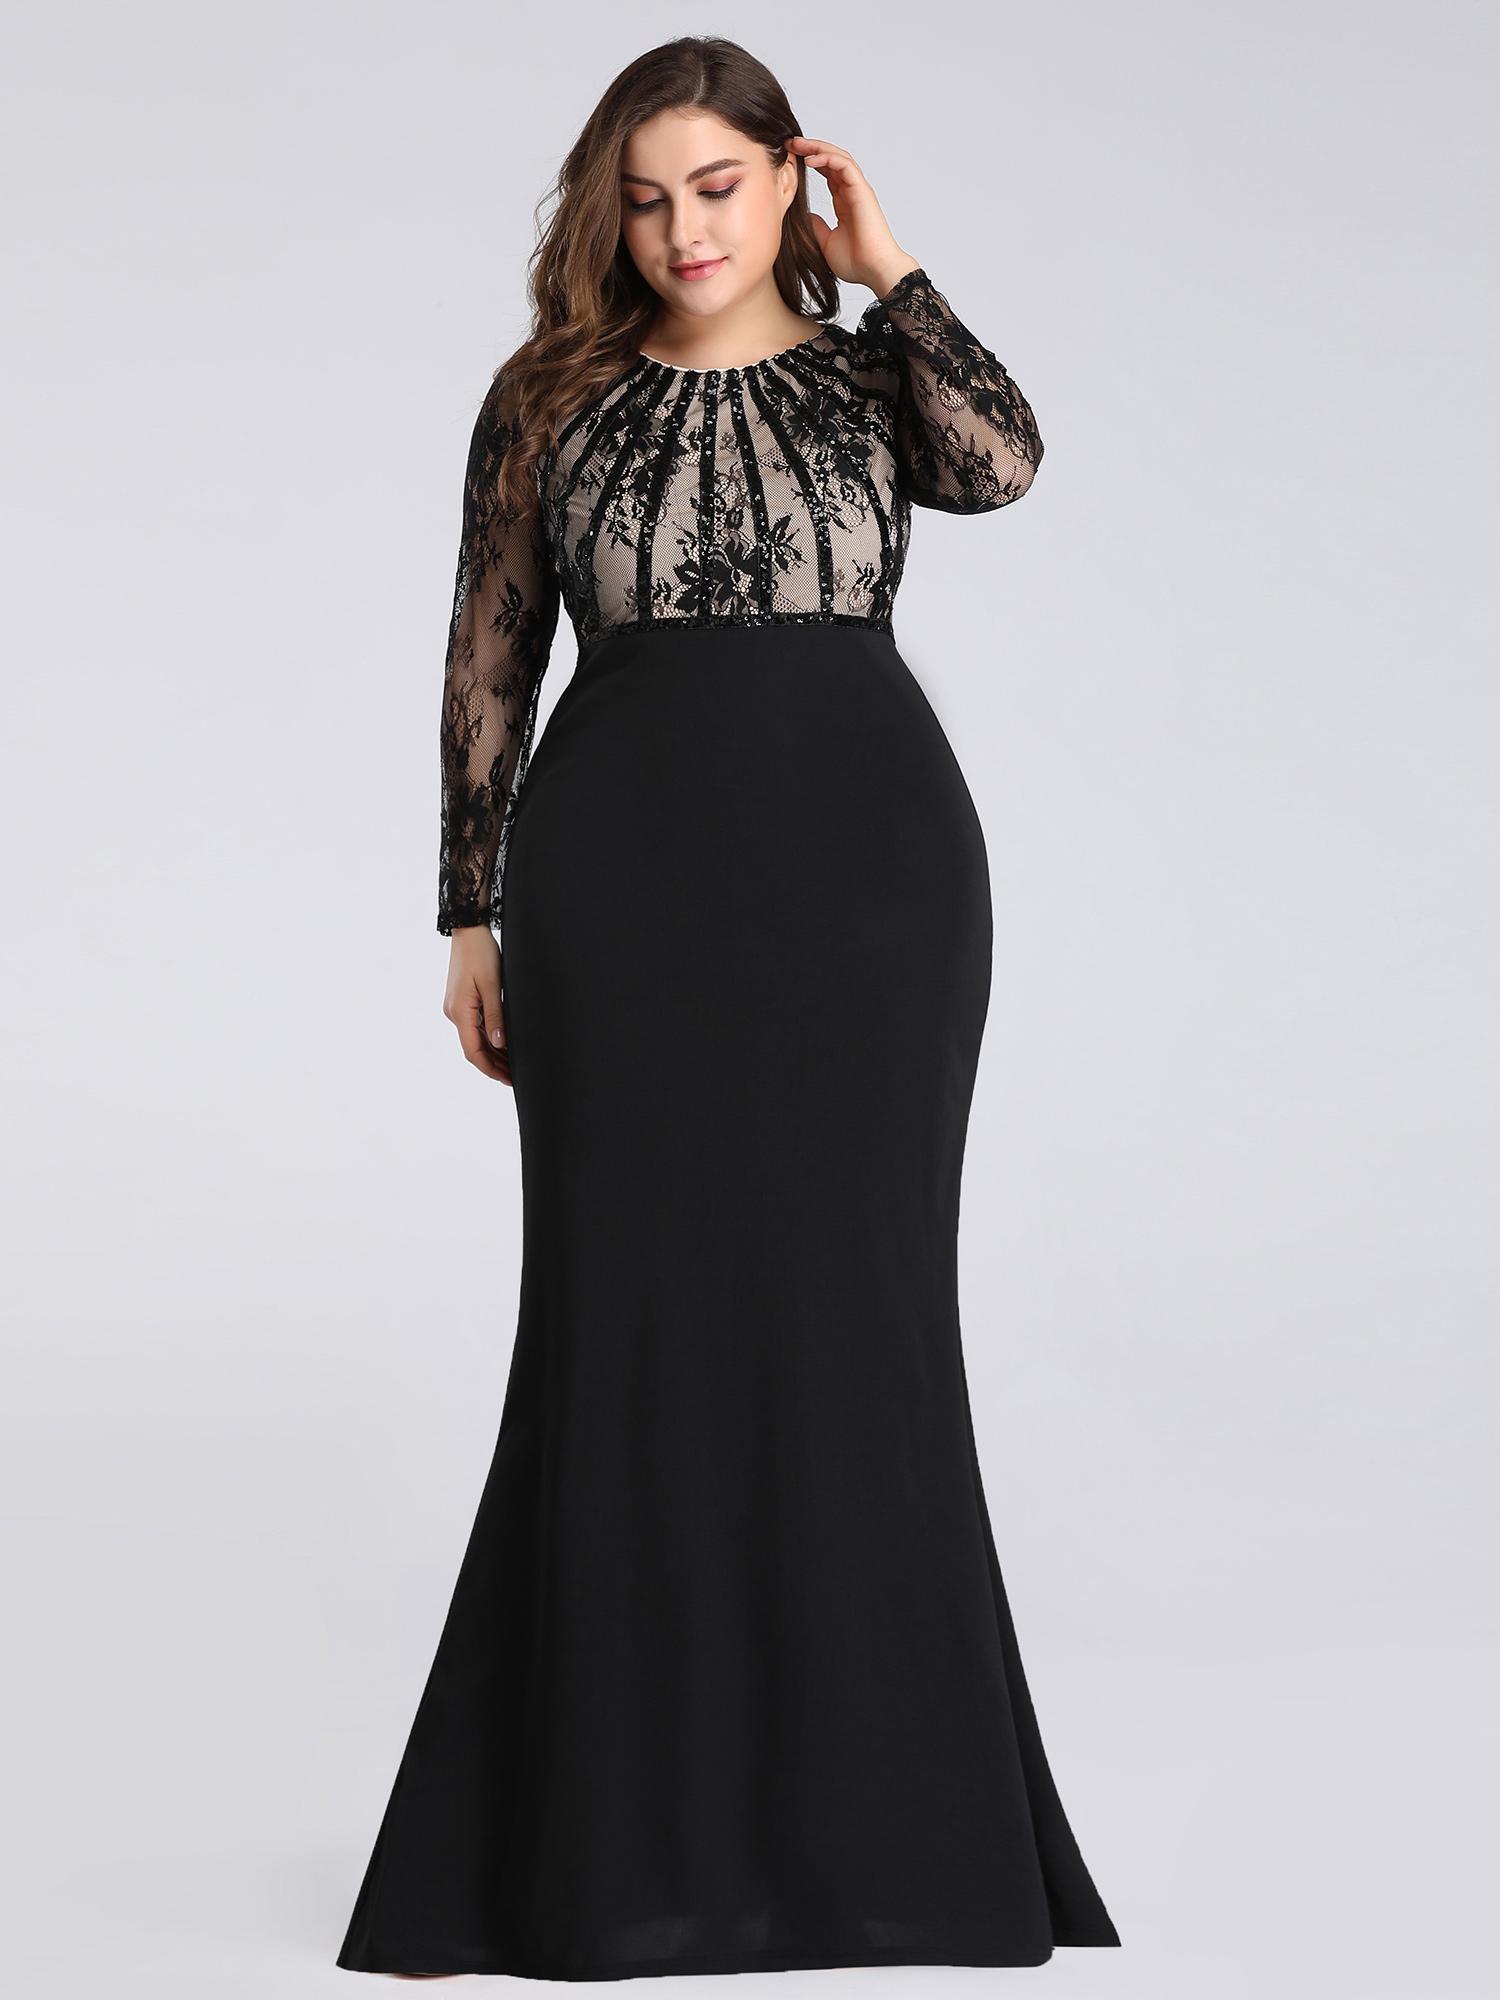 Details about Ever-Pretty Plus Size Black Lace Long Sleeve Bodycon Evening  Long Dresses 07771